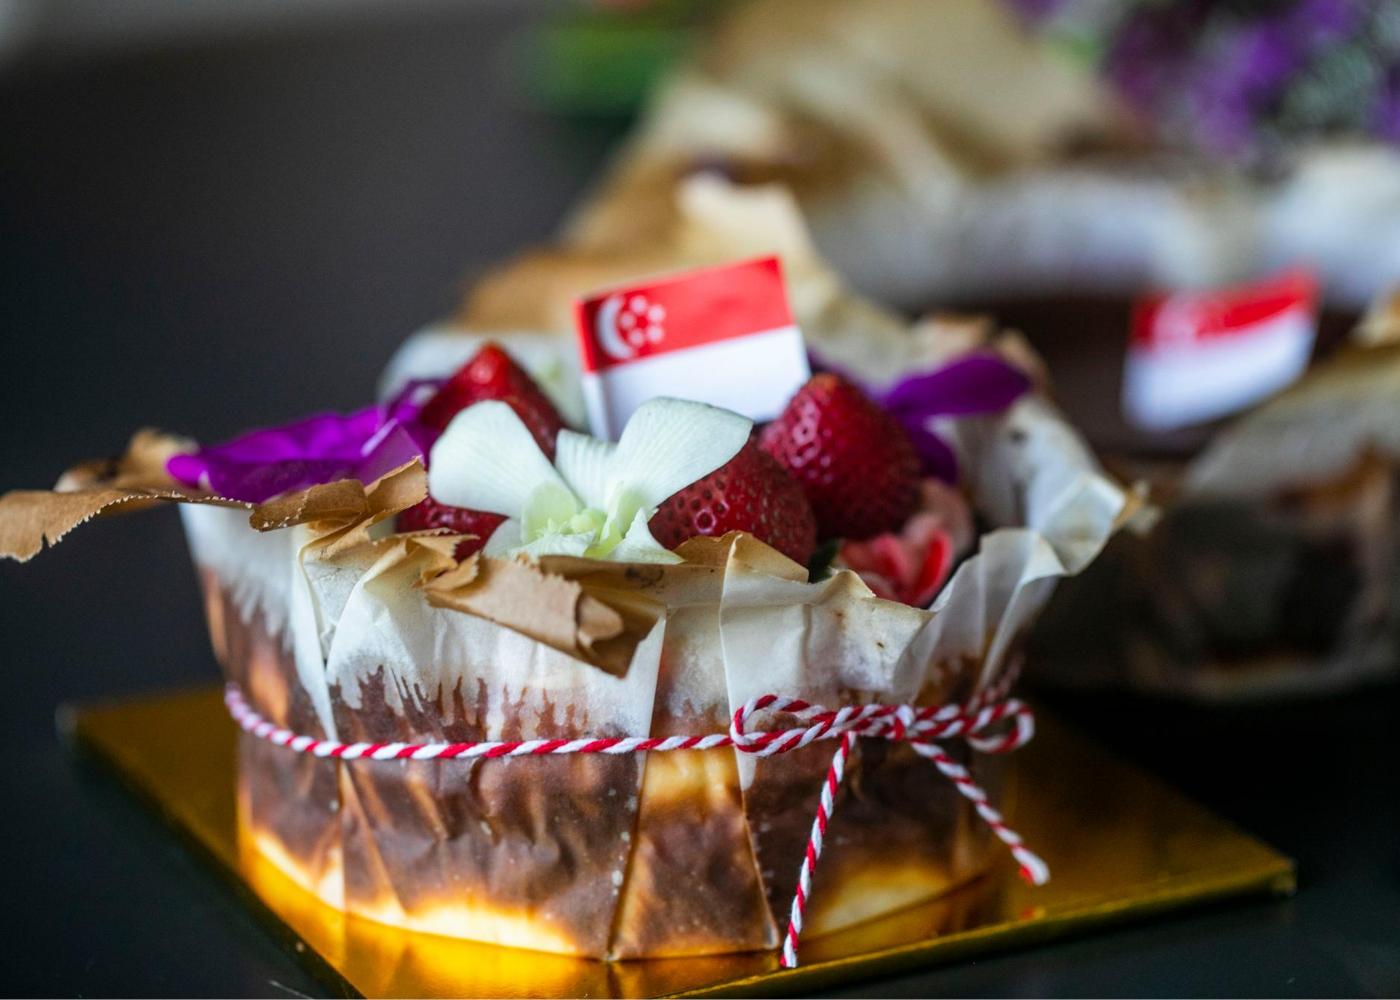 amrita's burnt cheesecake giveaway